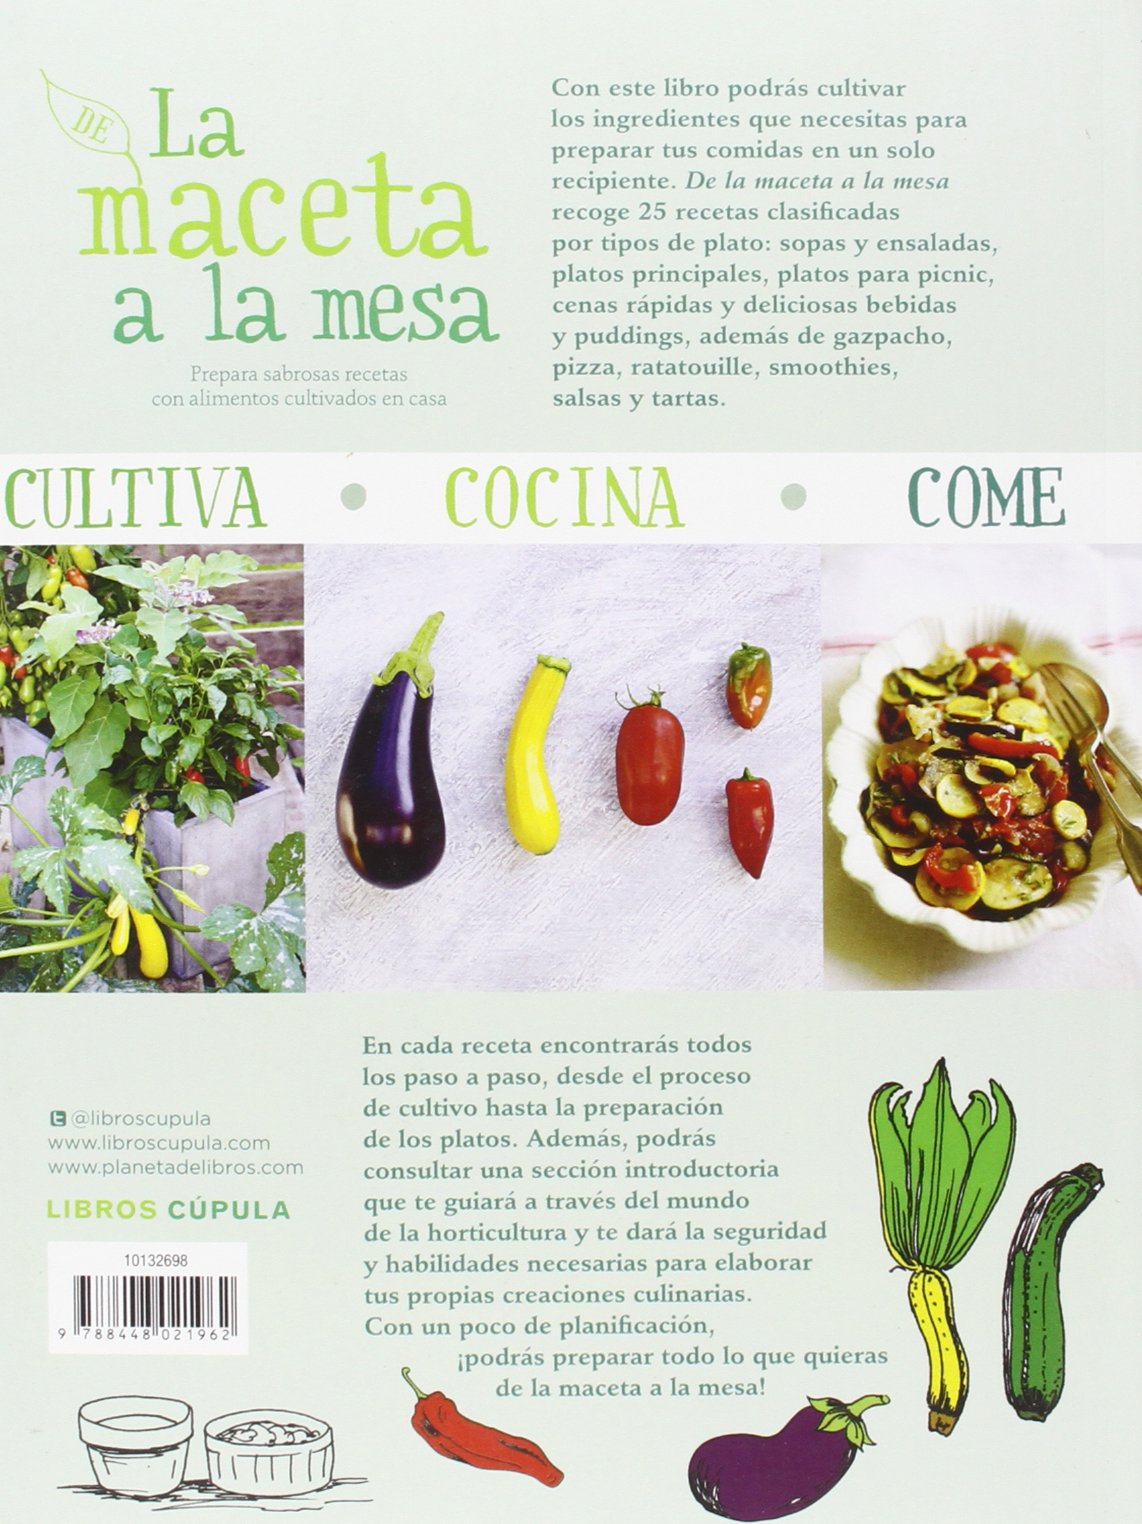 De la maceta a la mesa: Cinead McTernan: 9788448021962: Amazon.com: Books